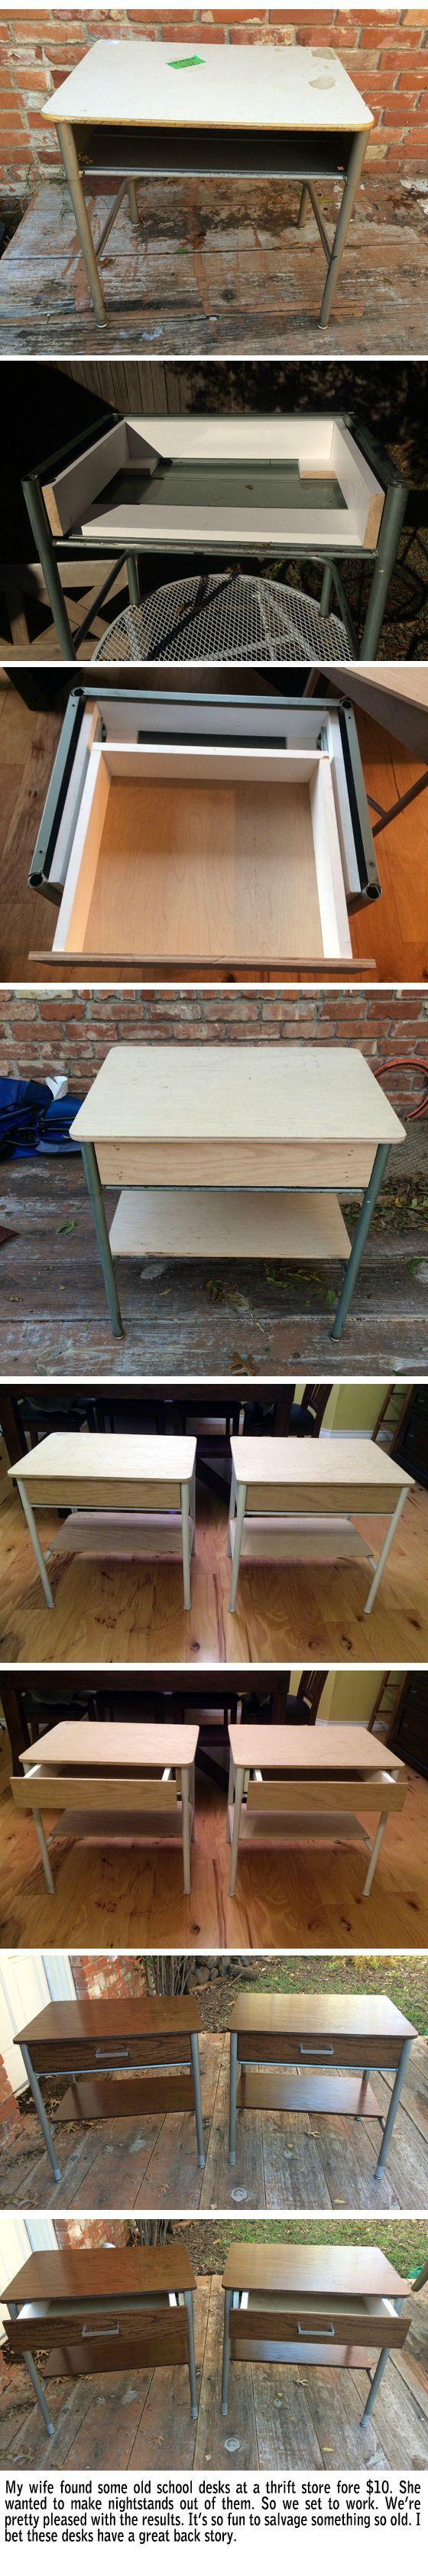 The wife is happy with her school desks - Imgur